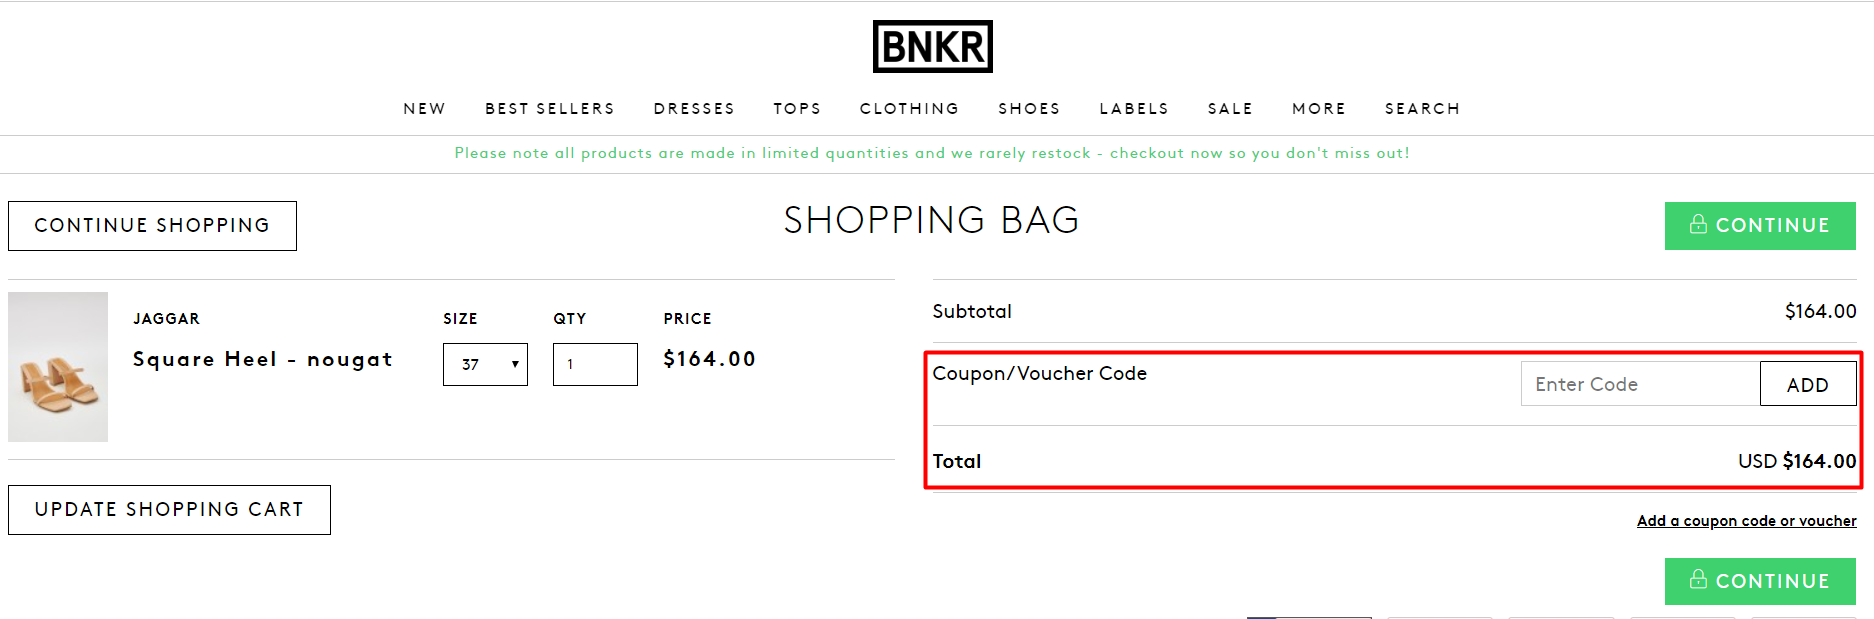 How do I use my BNKR discount code?